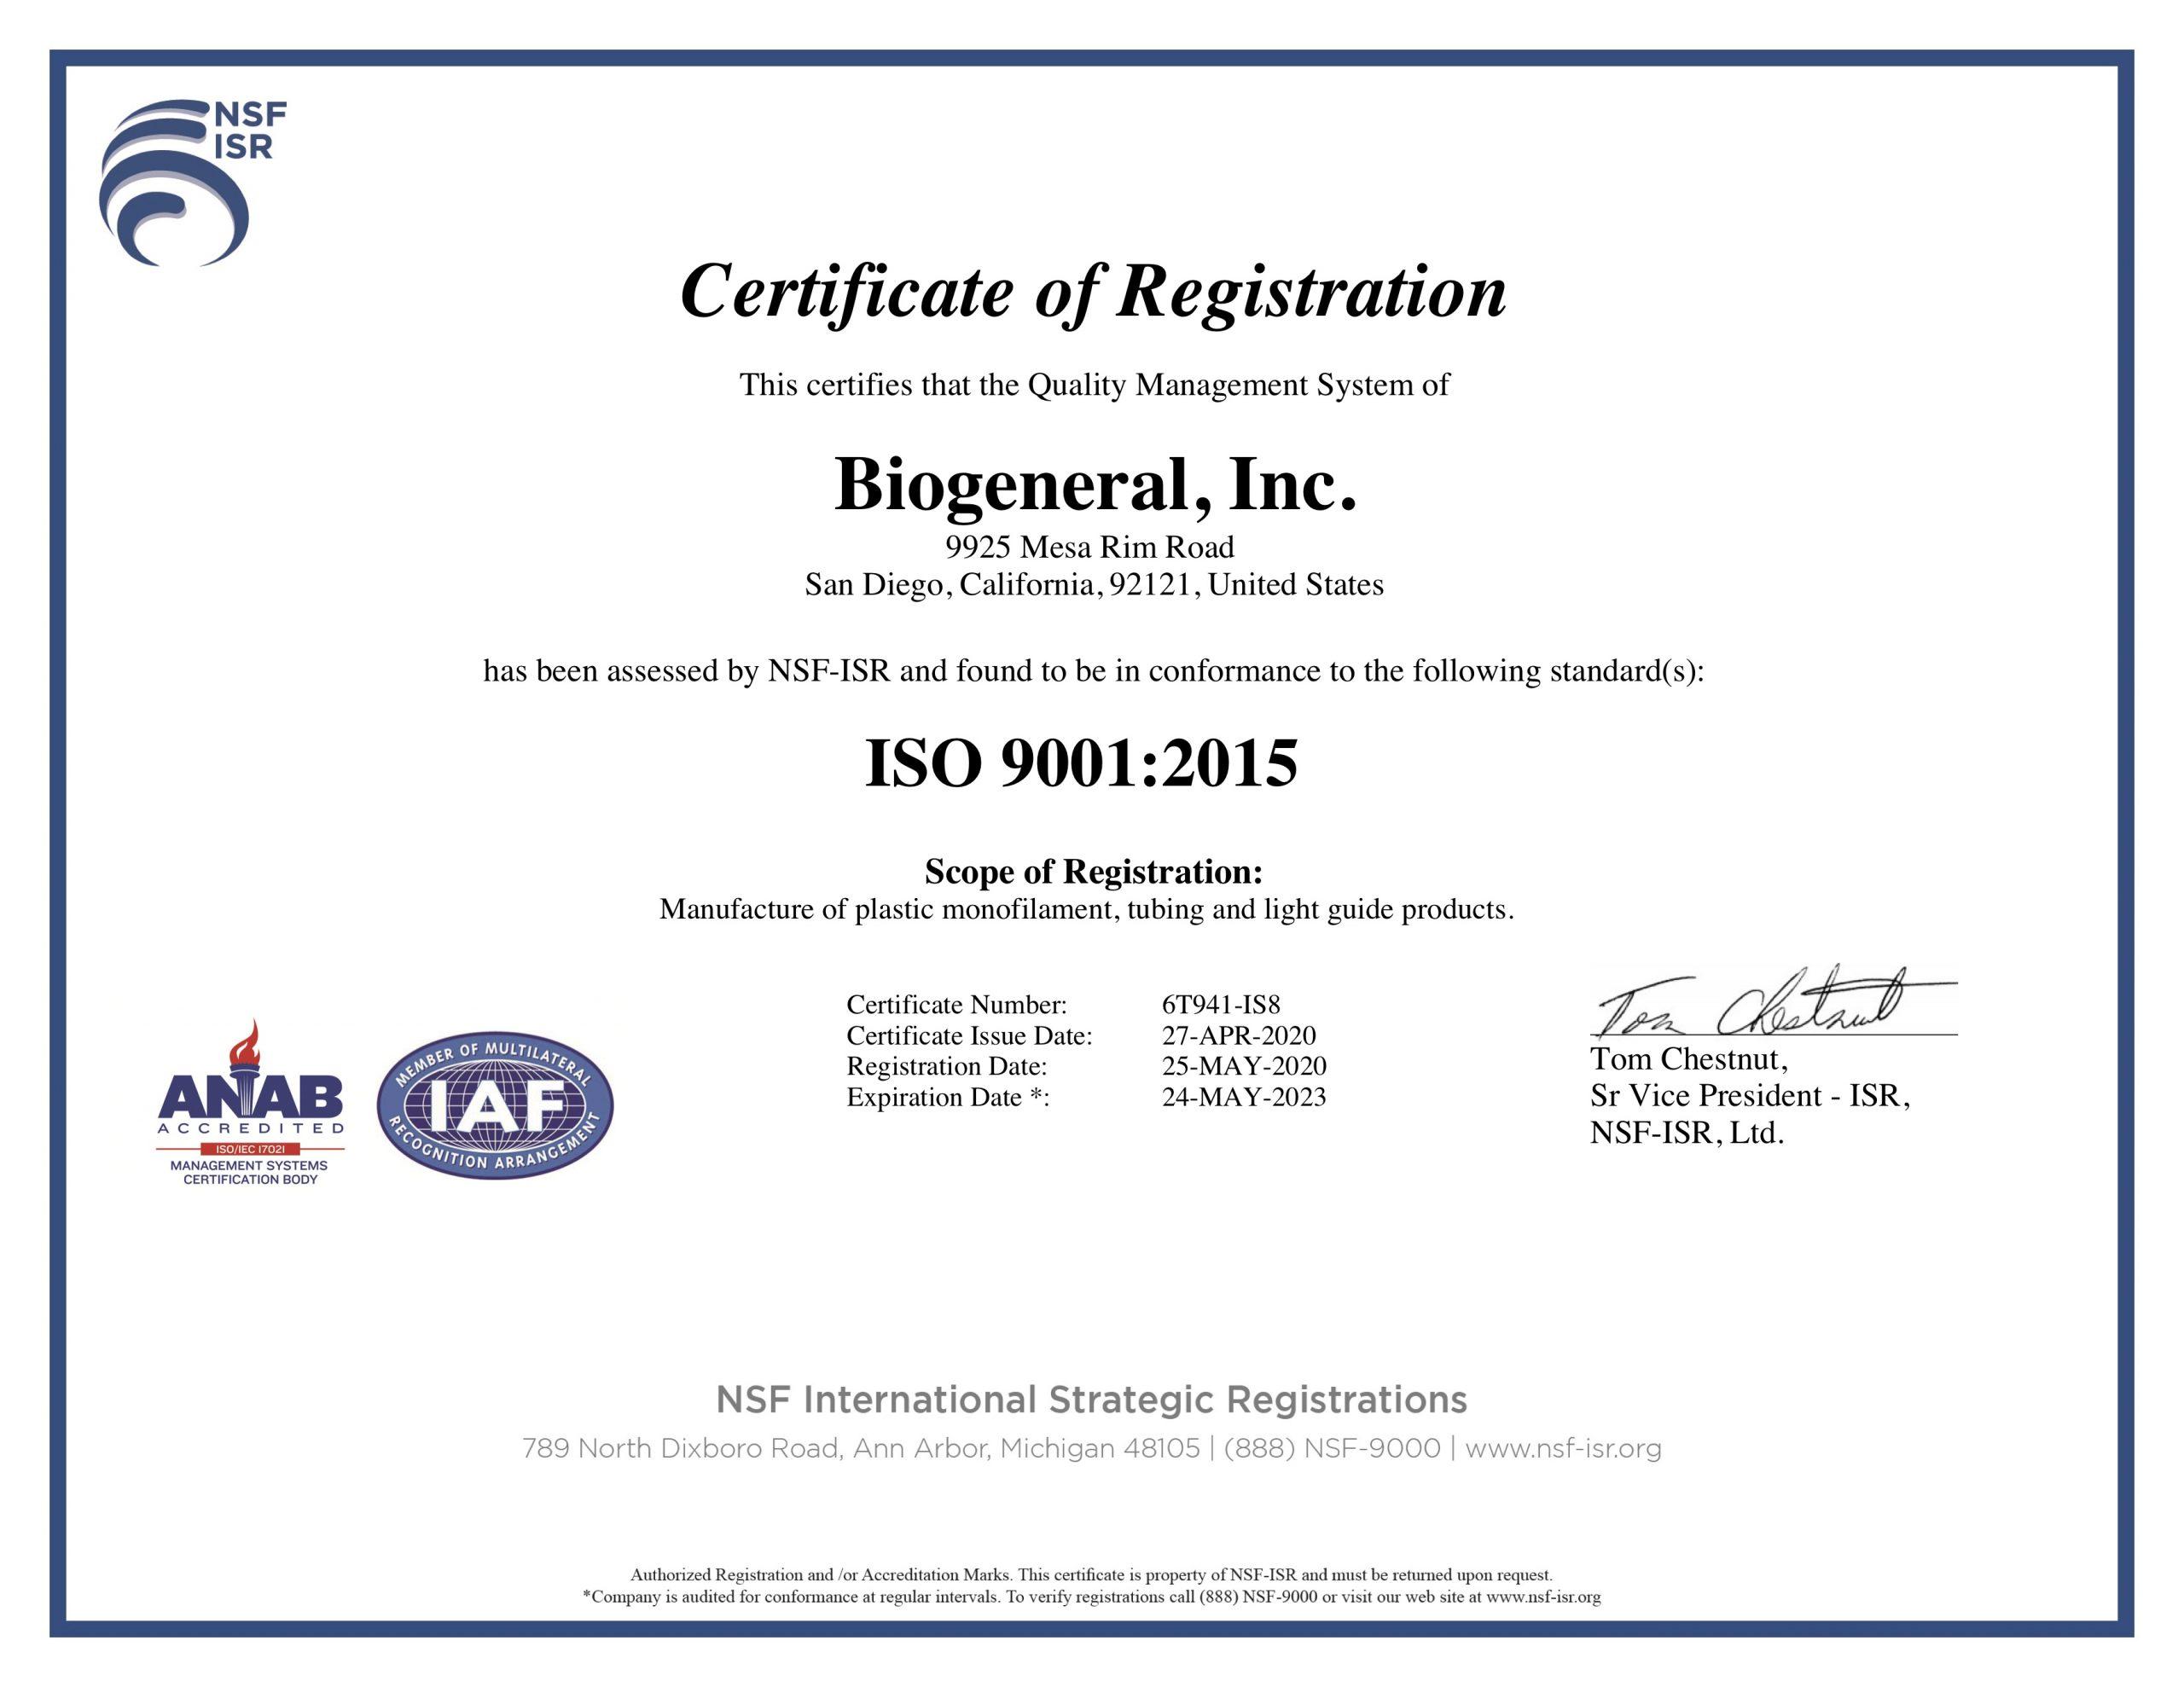 Biogeneral, Inc. ISO 9001:2015 Certificate